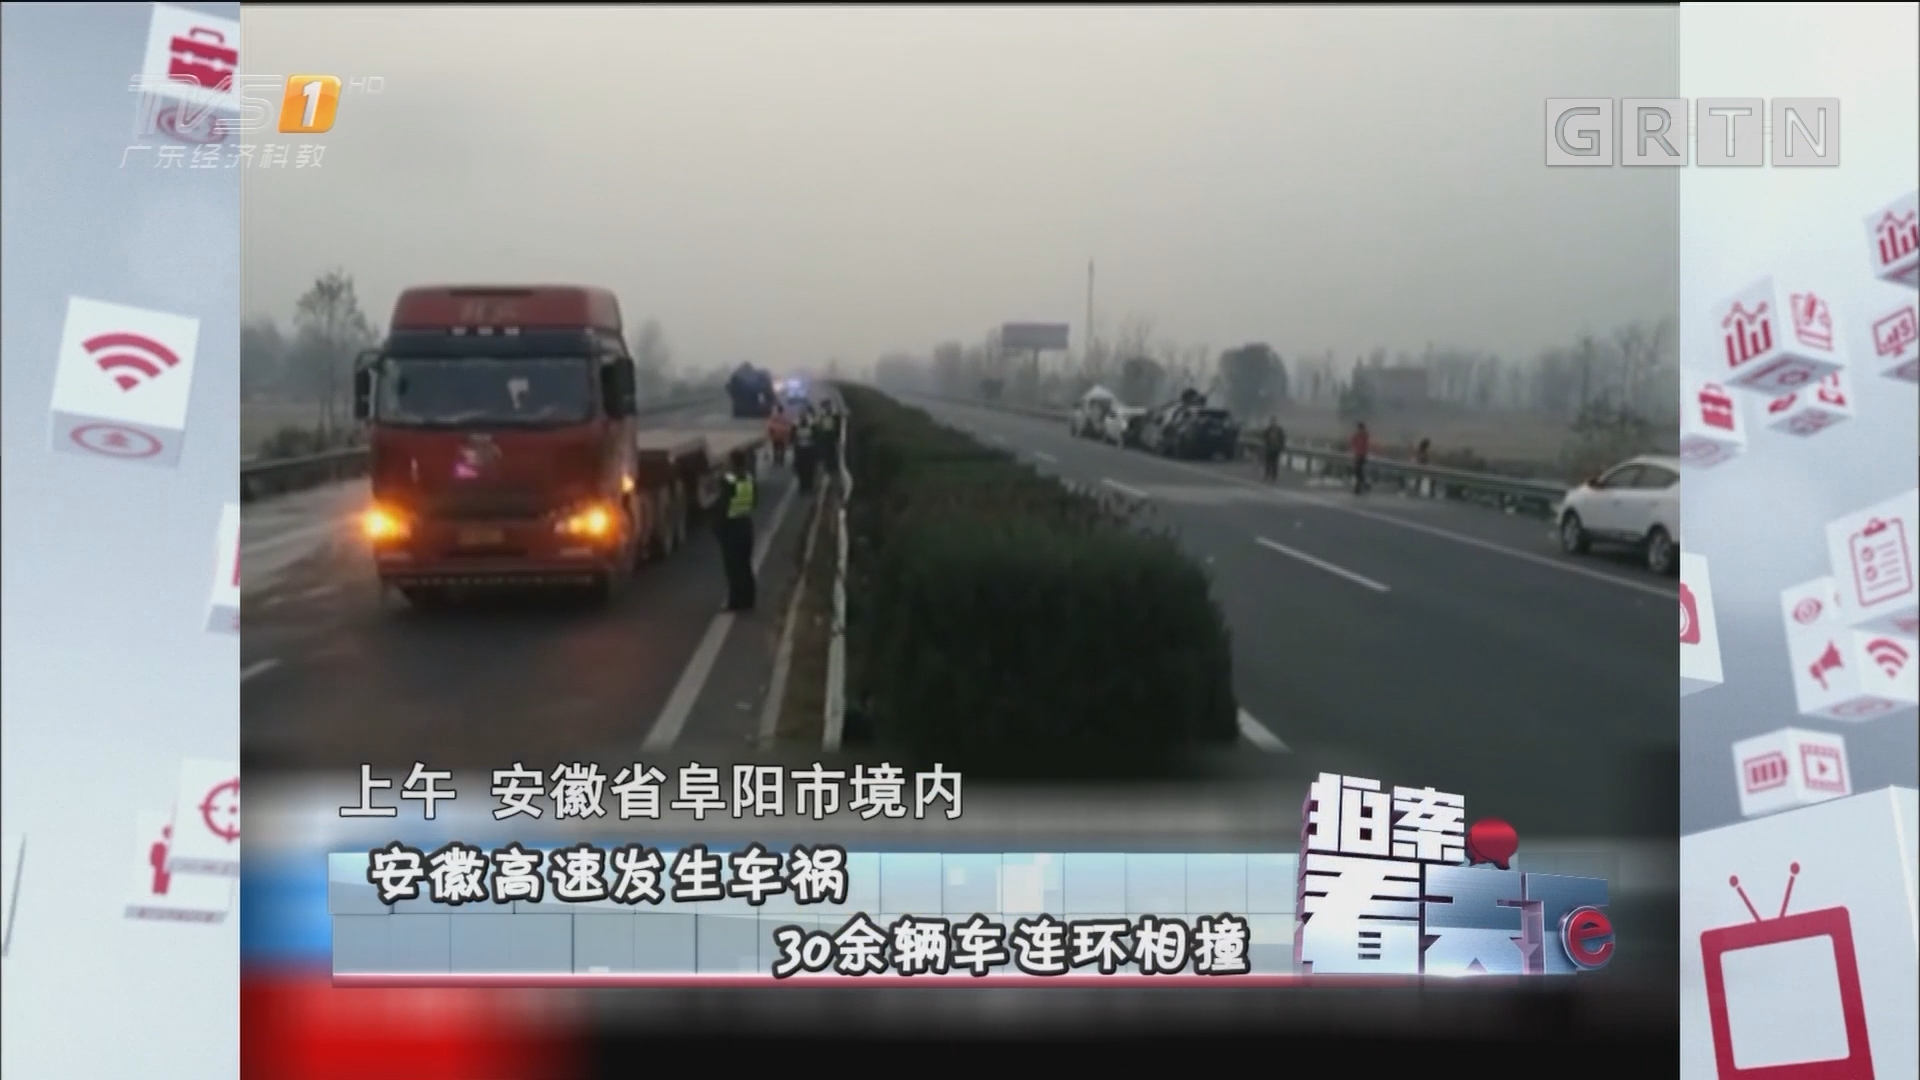 [HD][2017-11-16]拍案看天下:安徽高速发生车祸 30余辆车连环相撞